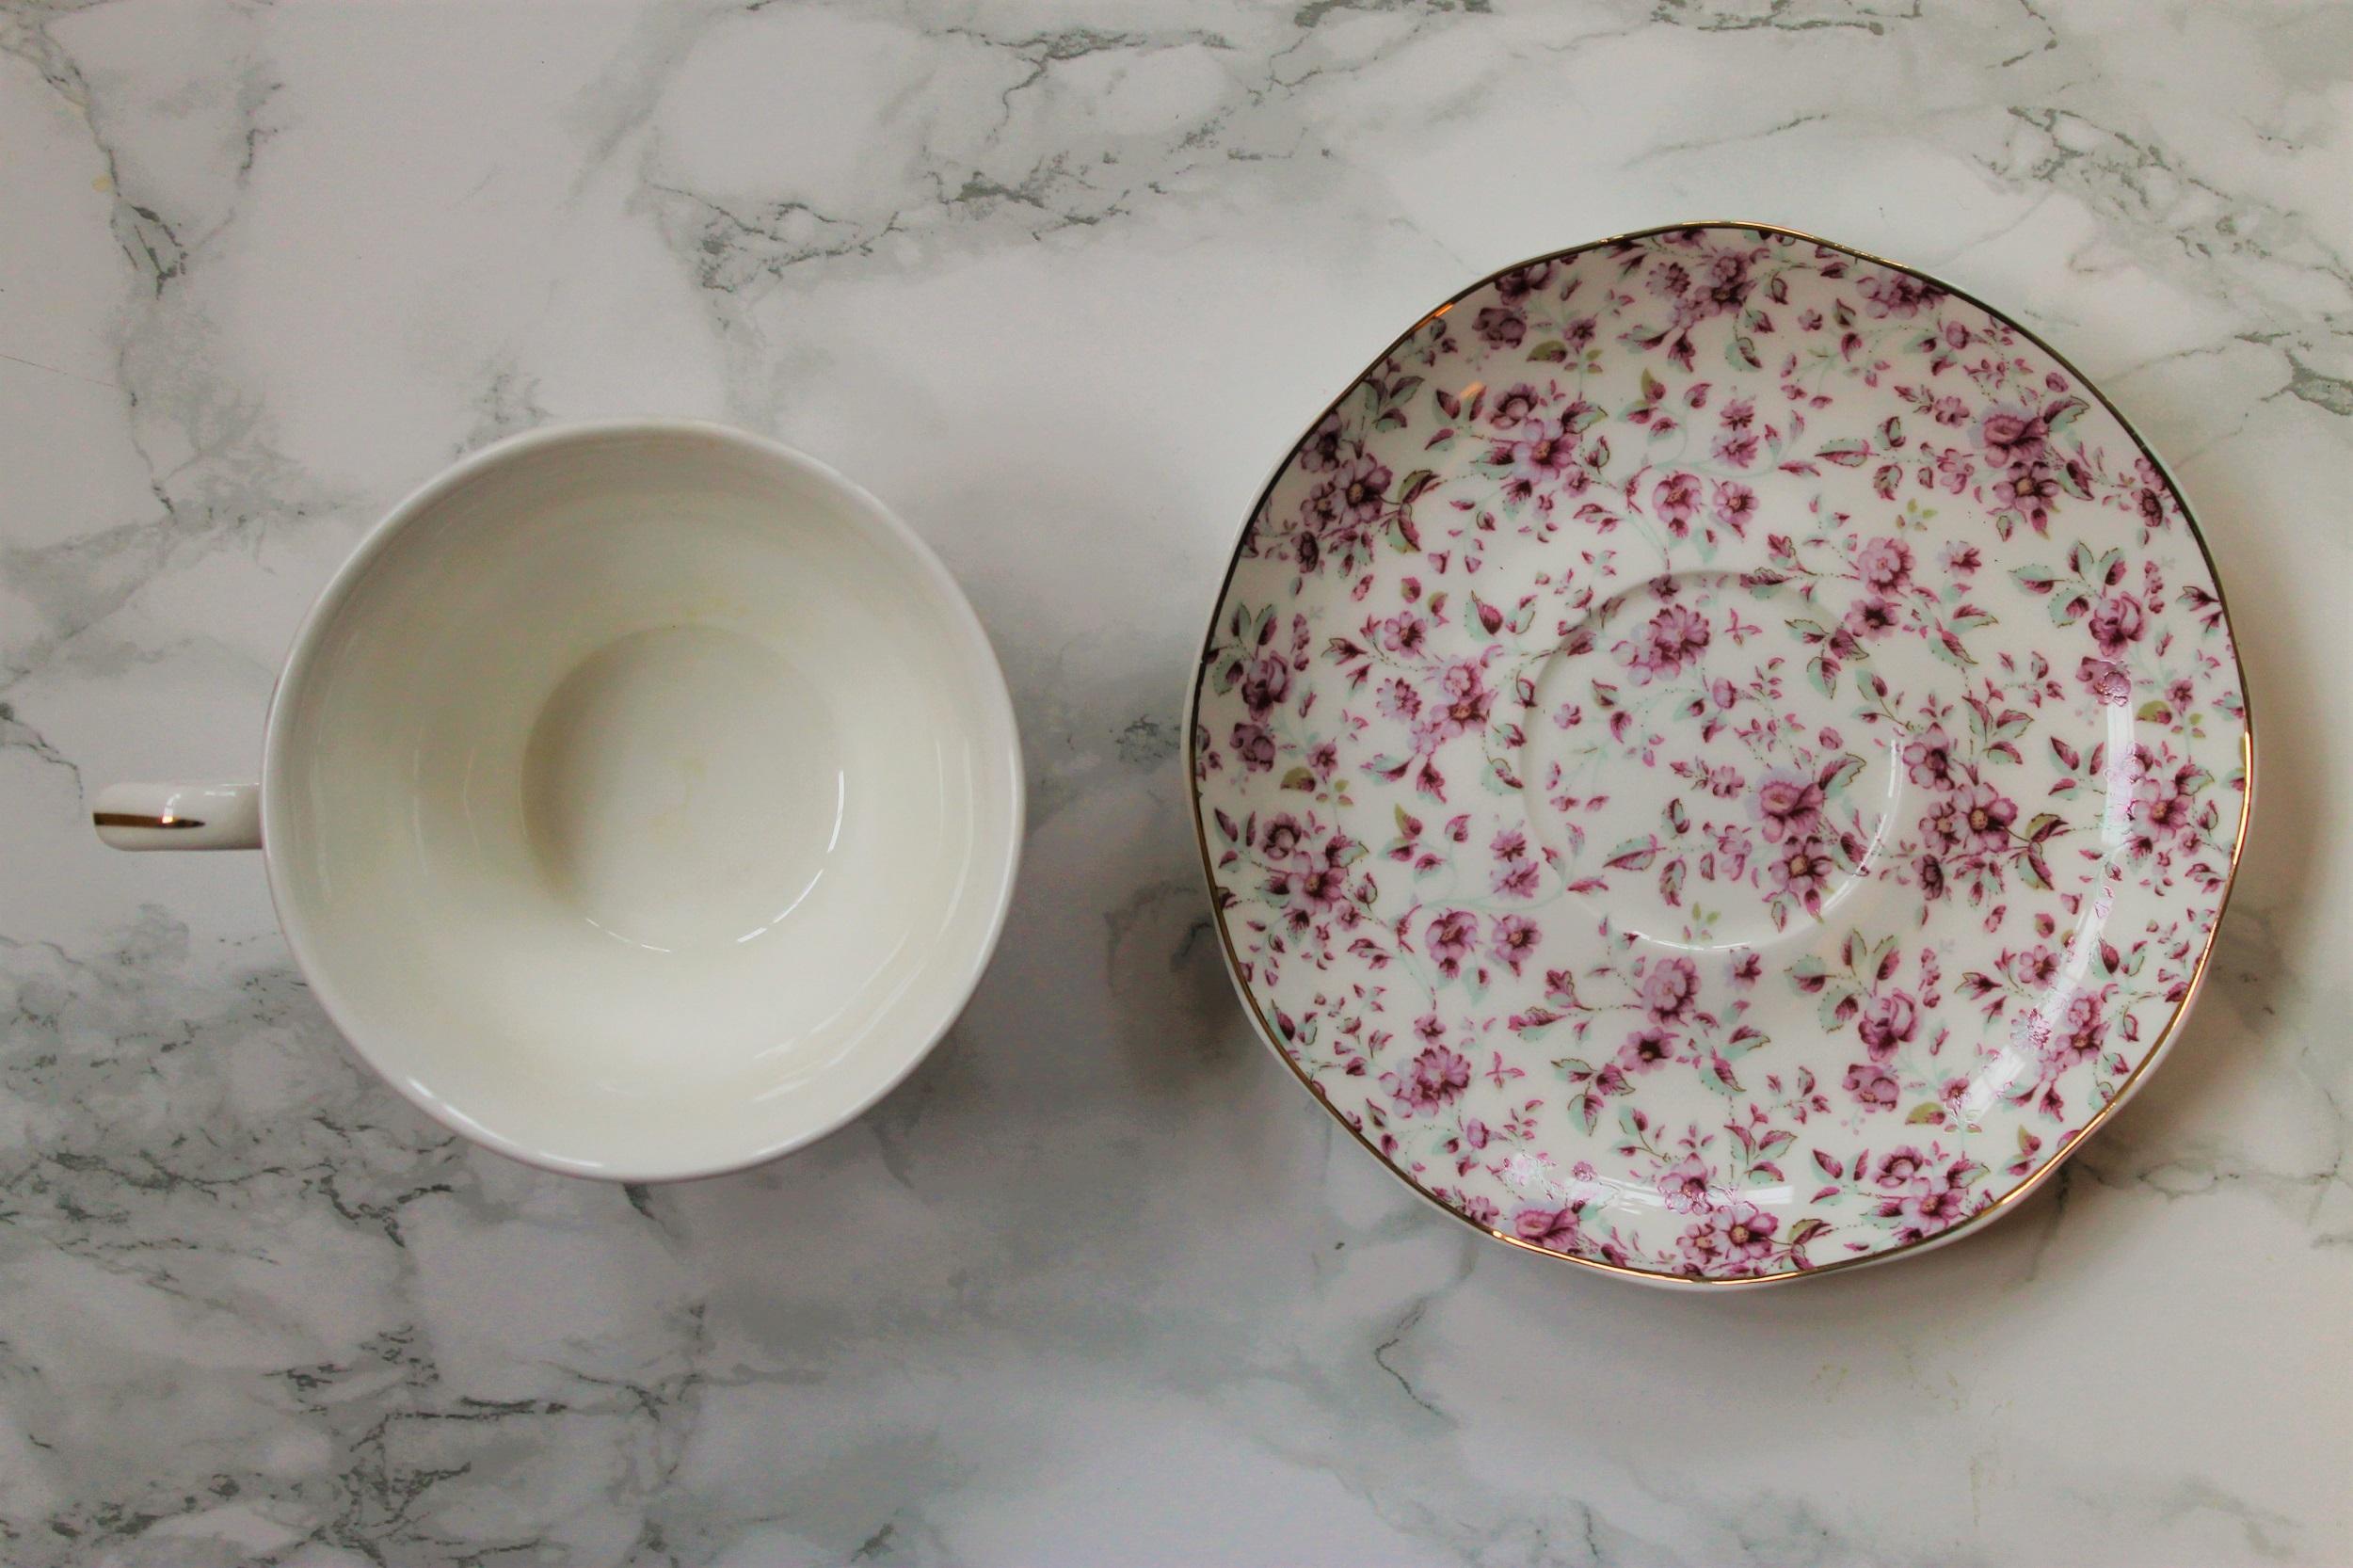 katie alice teacup and saucer